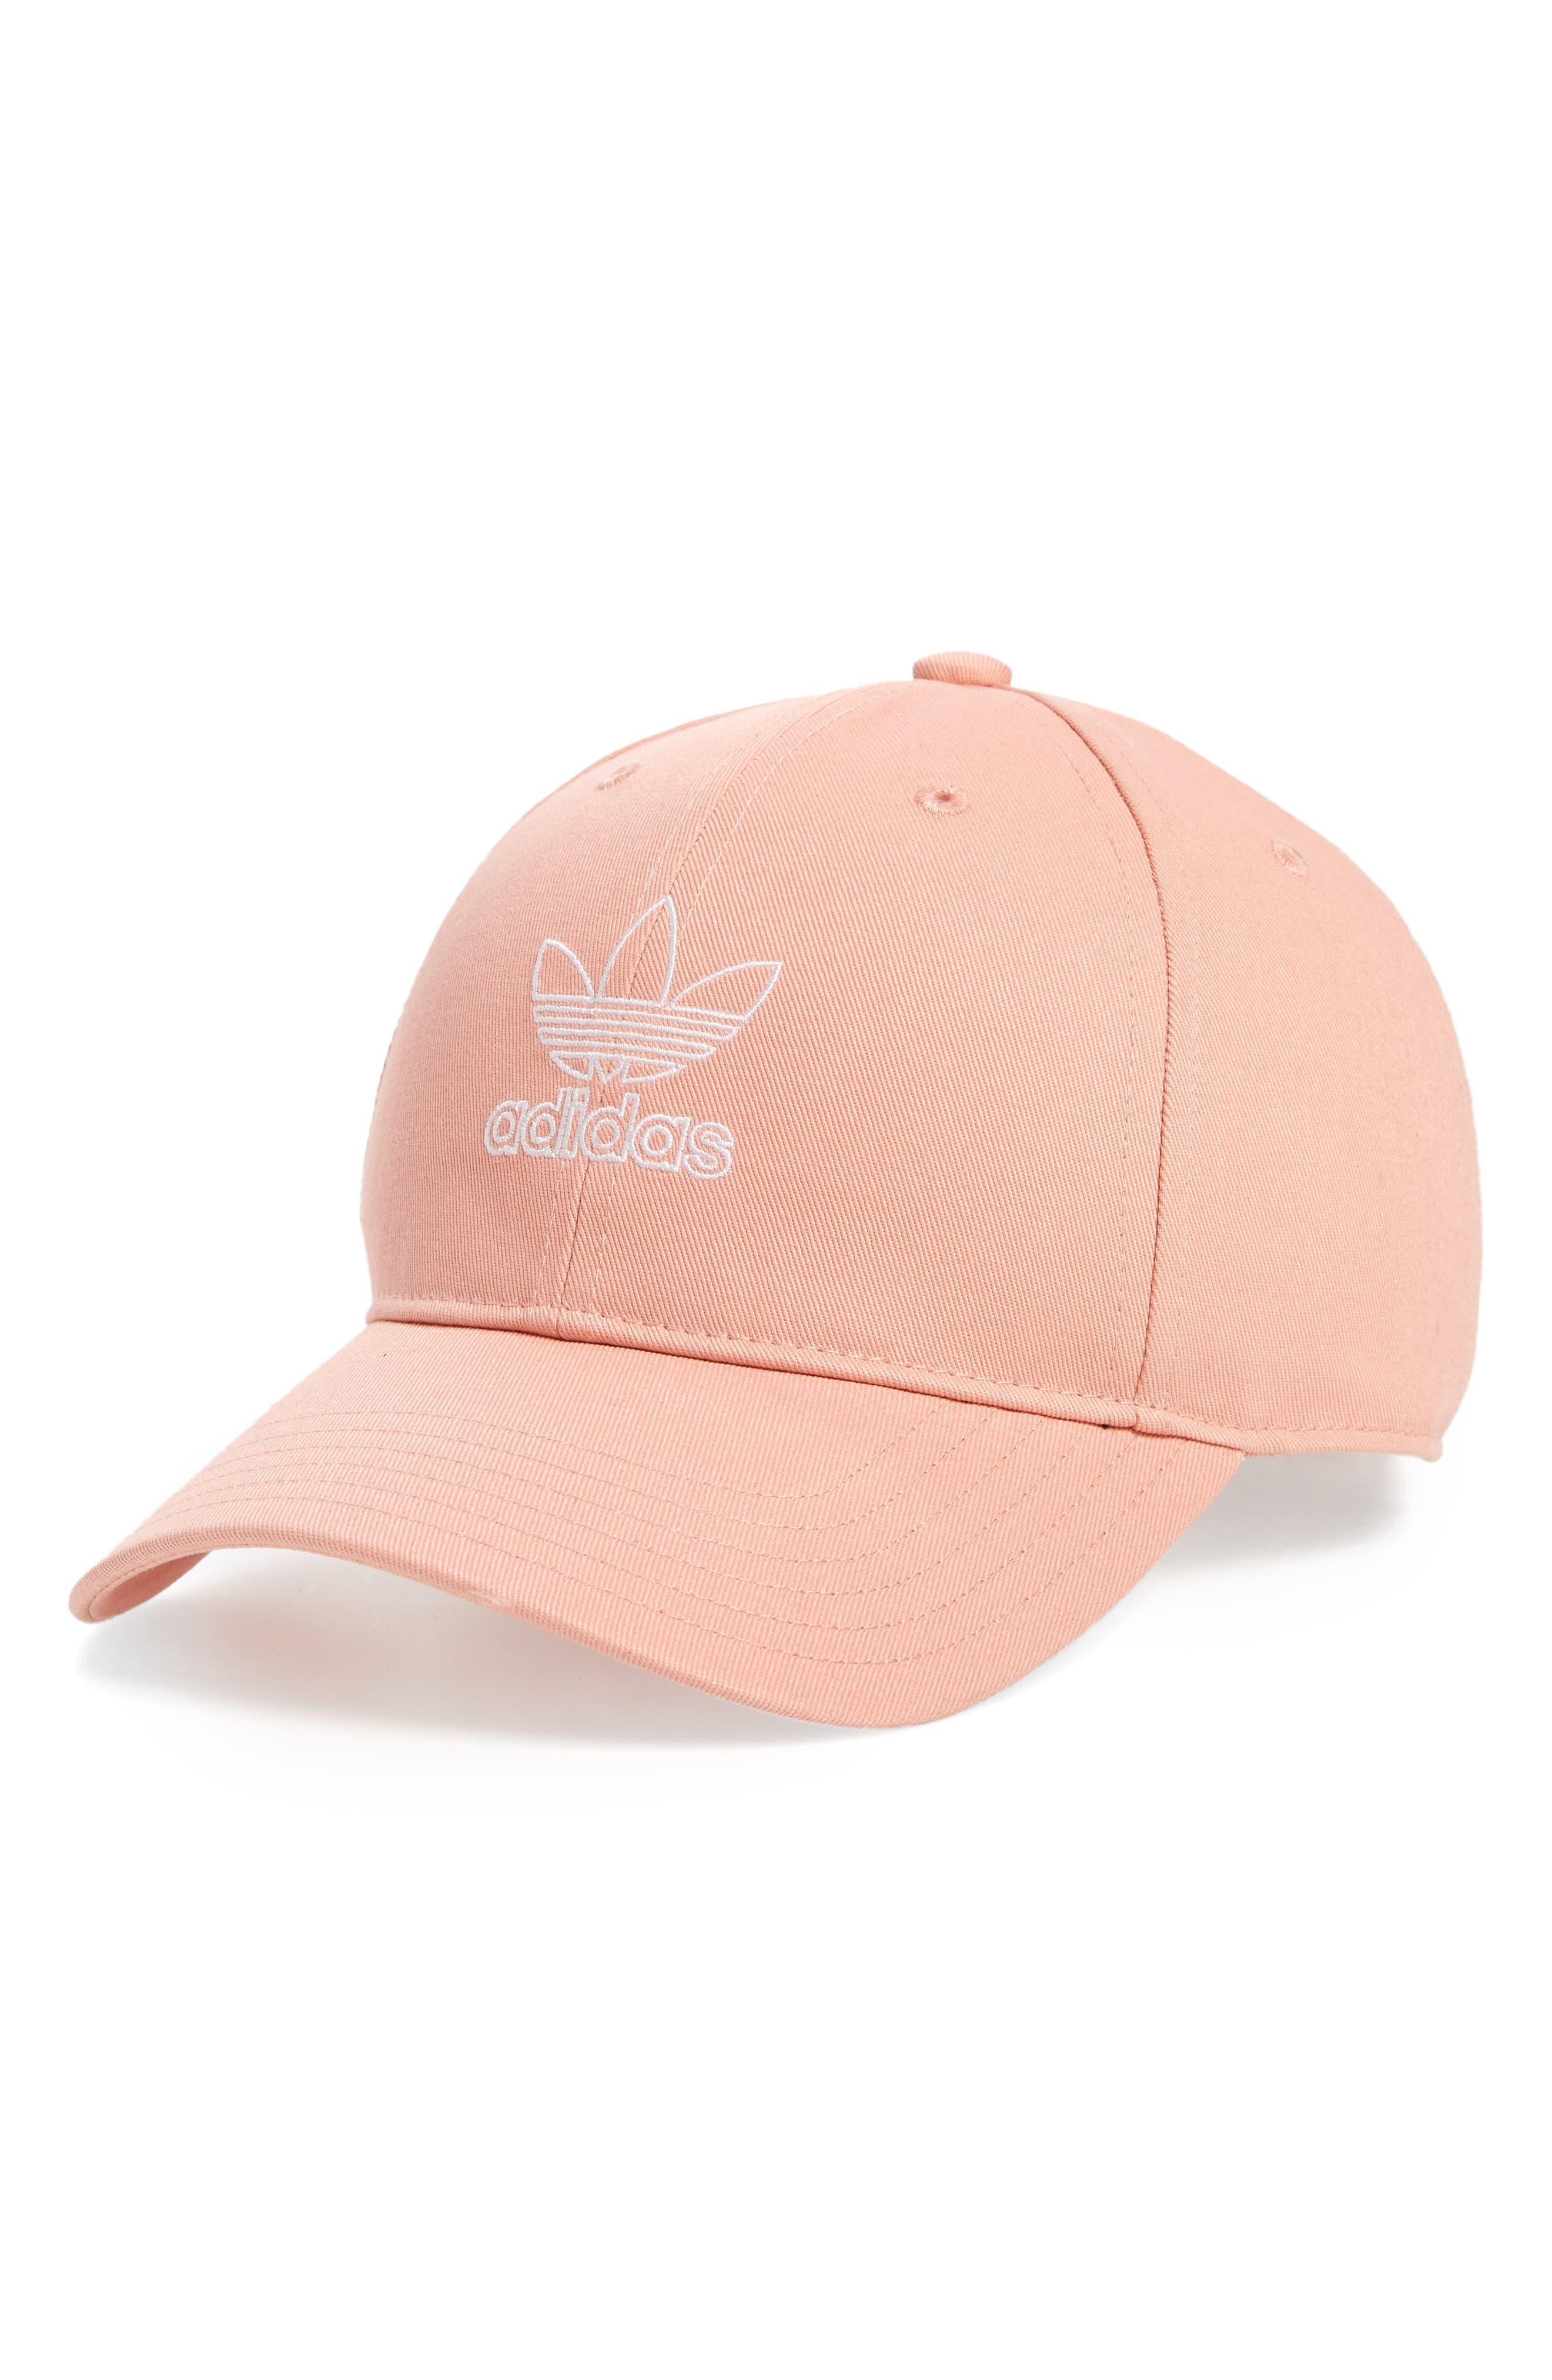 6beb4985c Buy adidas hats for women - Best women's adidas hats shop - Cools.com